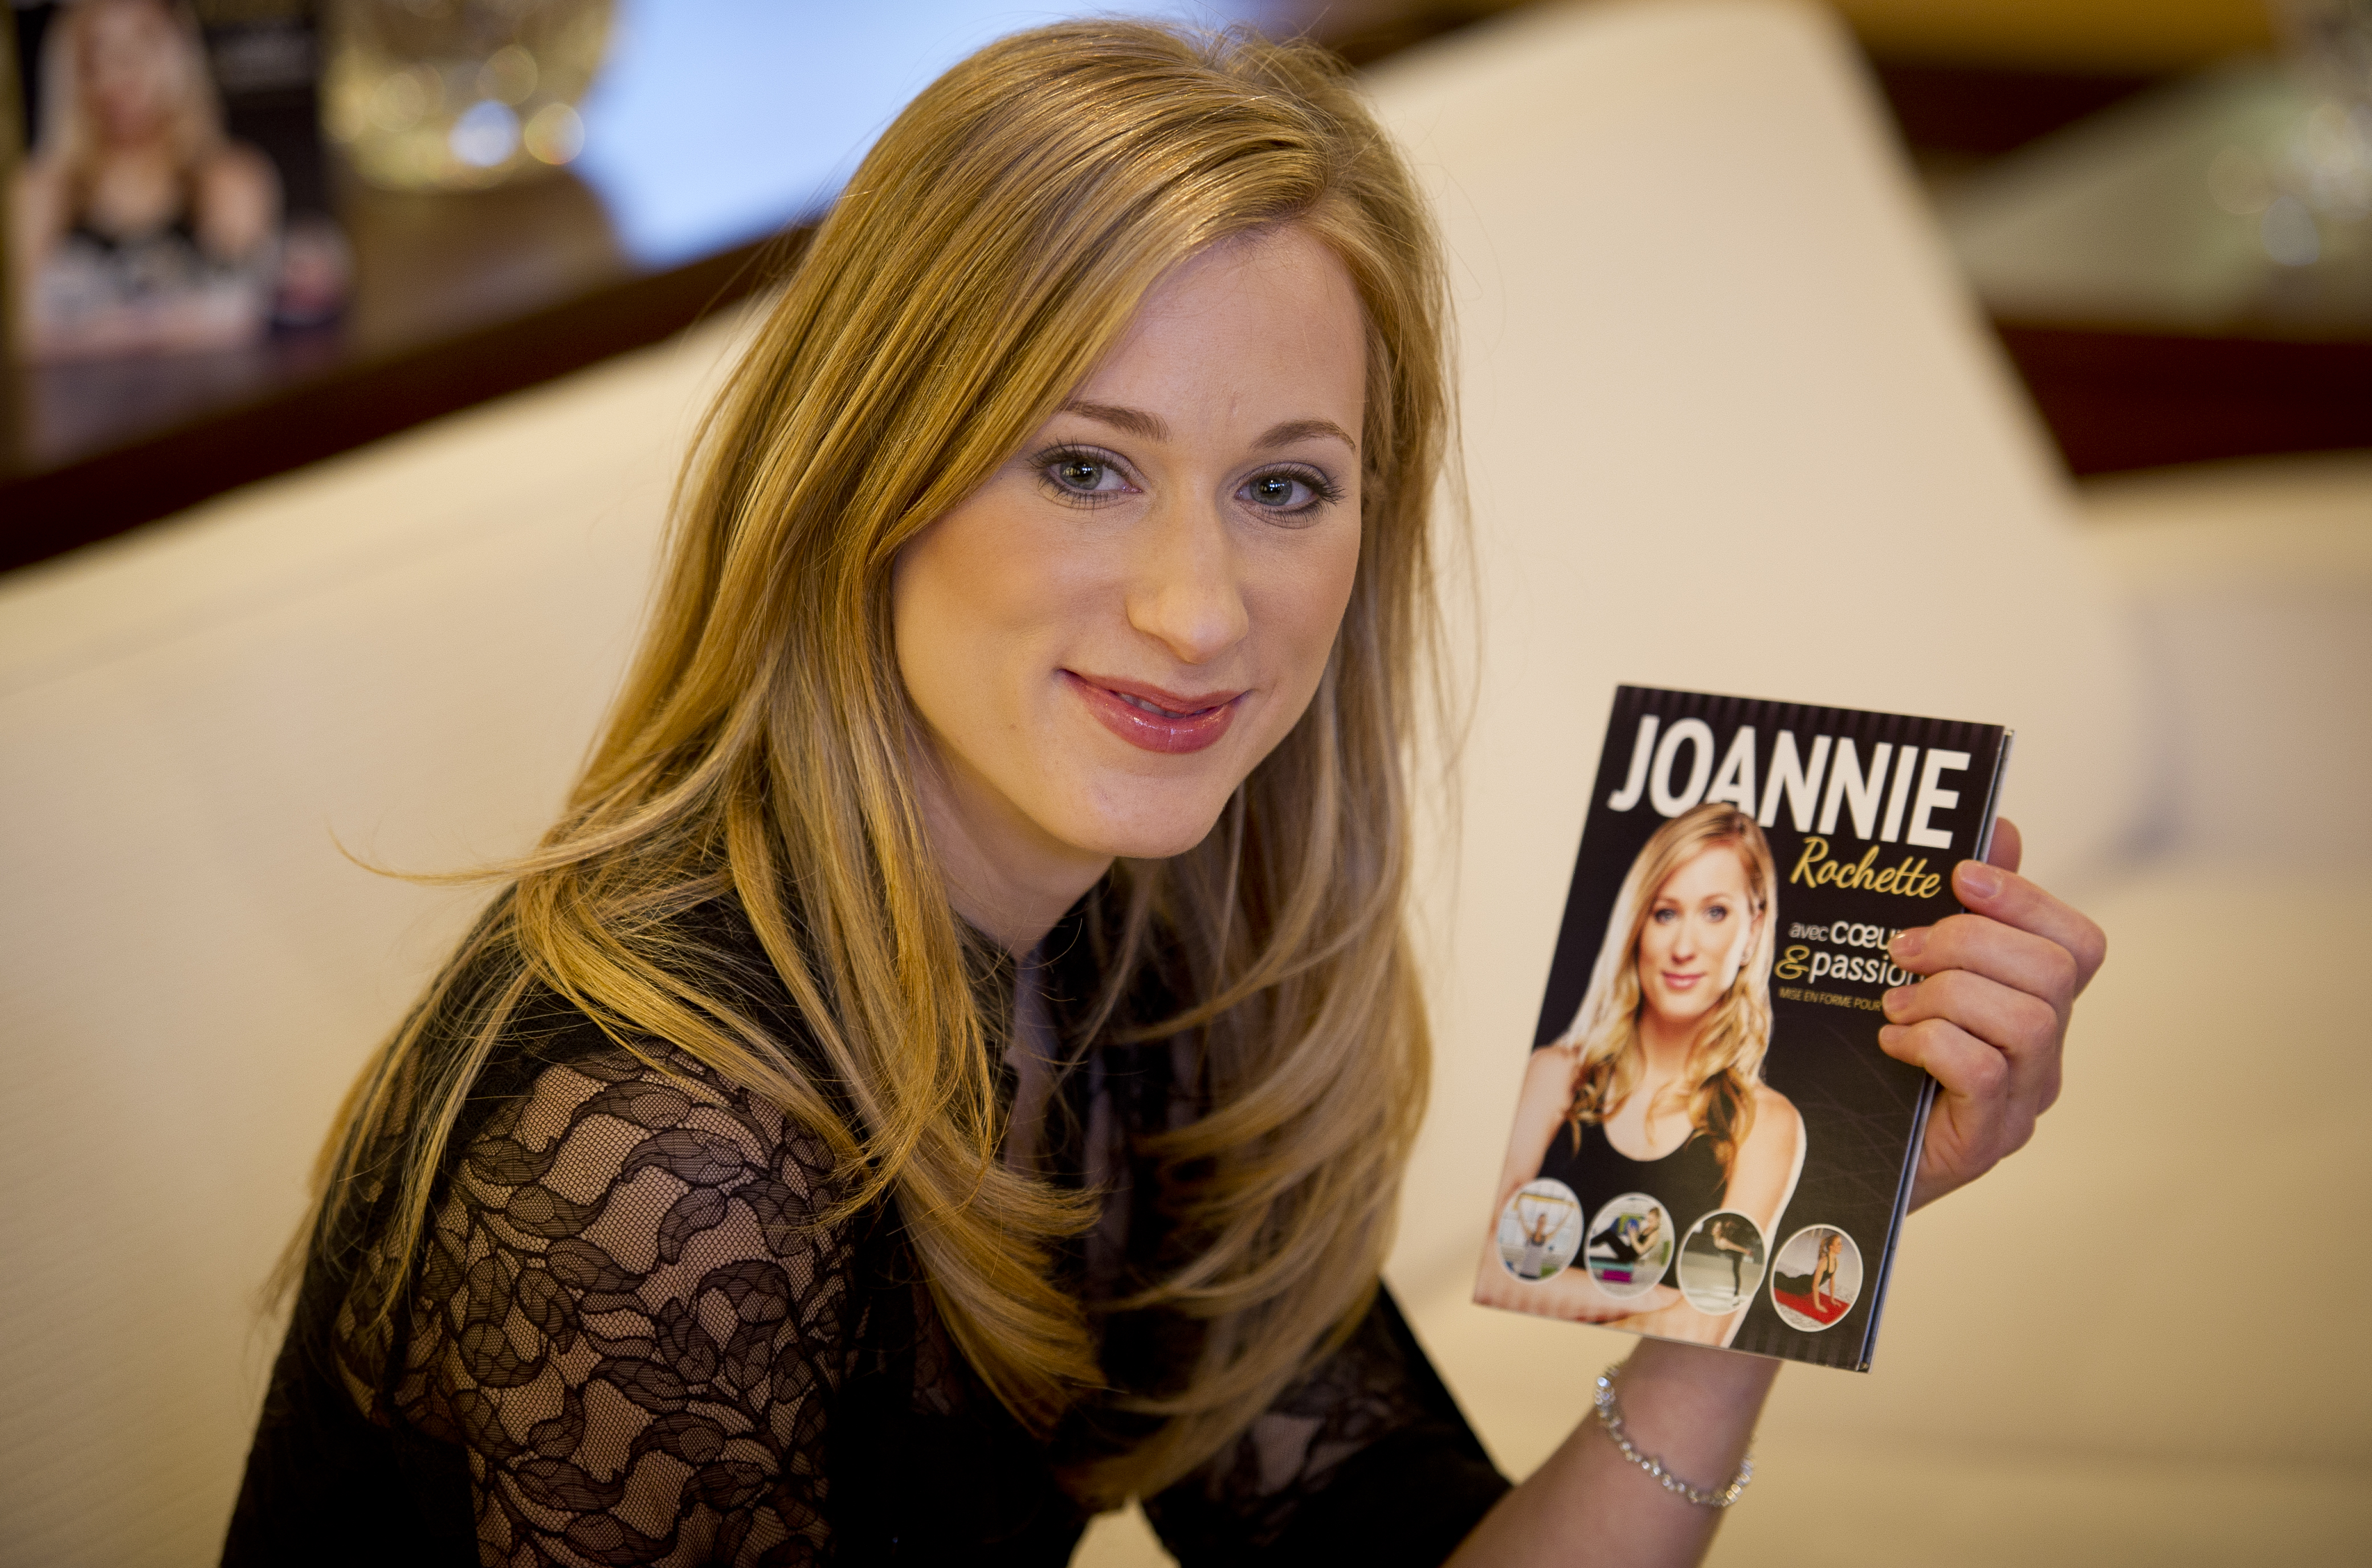 Joannie Rochette Latest Photo